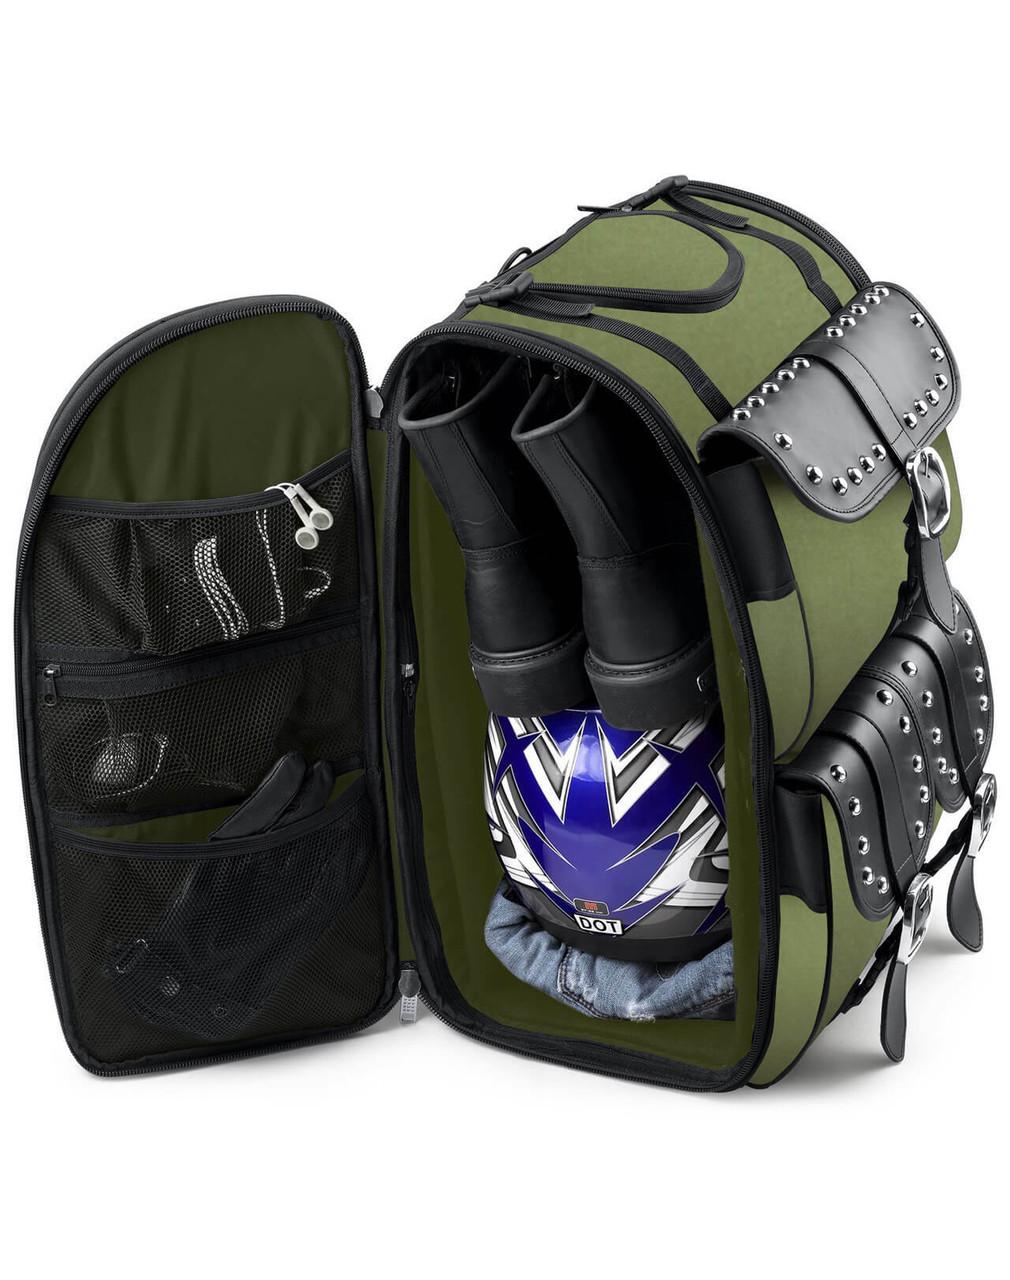 VikingBags Extra Large Studded Green Suzuki Motorcycle Tail Bag Storage View